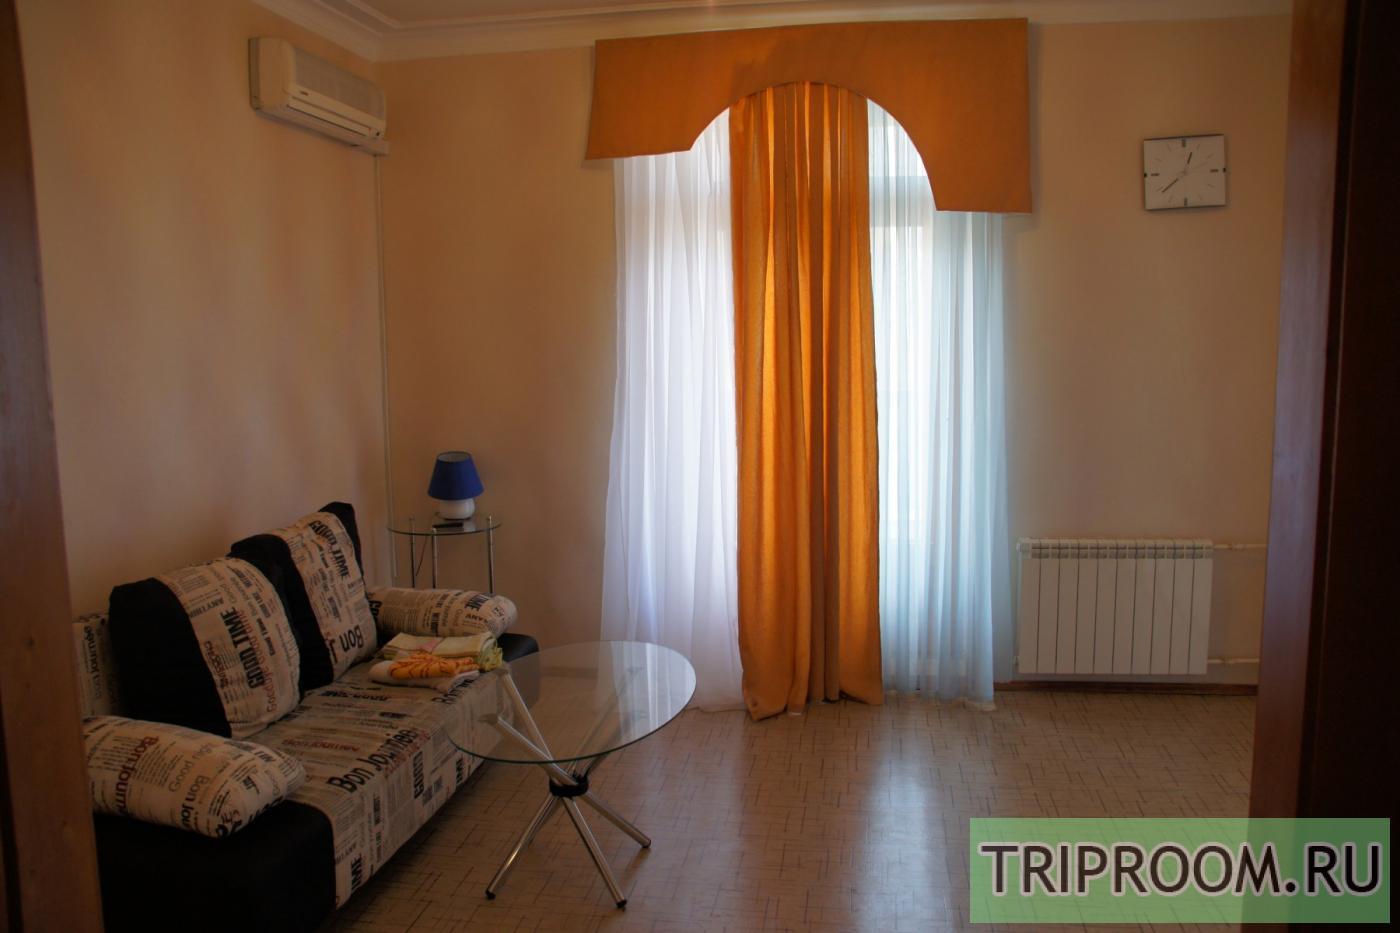 2-комнатная квартира посуточно (вариант № 18696), ул. Мира улица, фото № 7